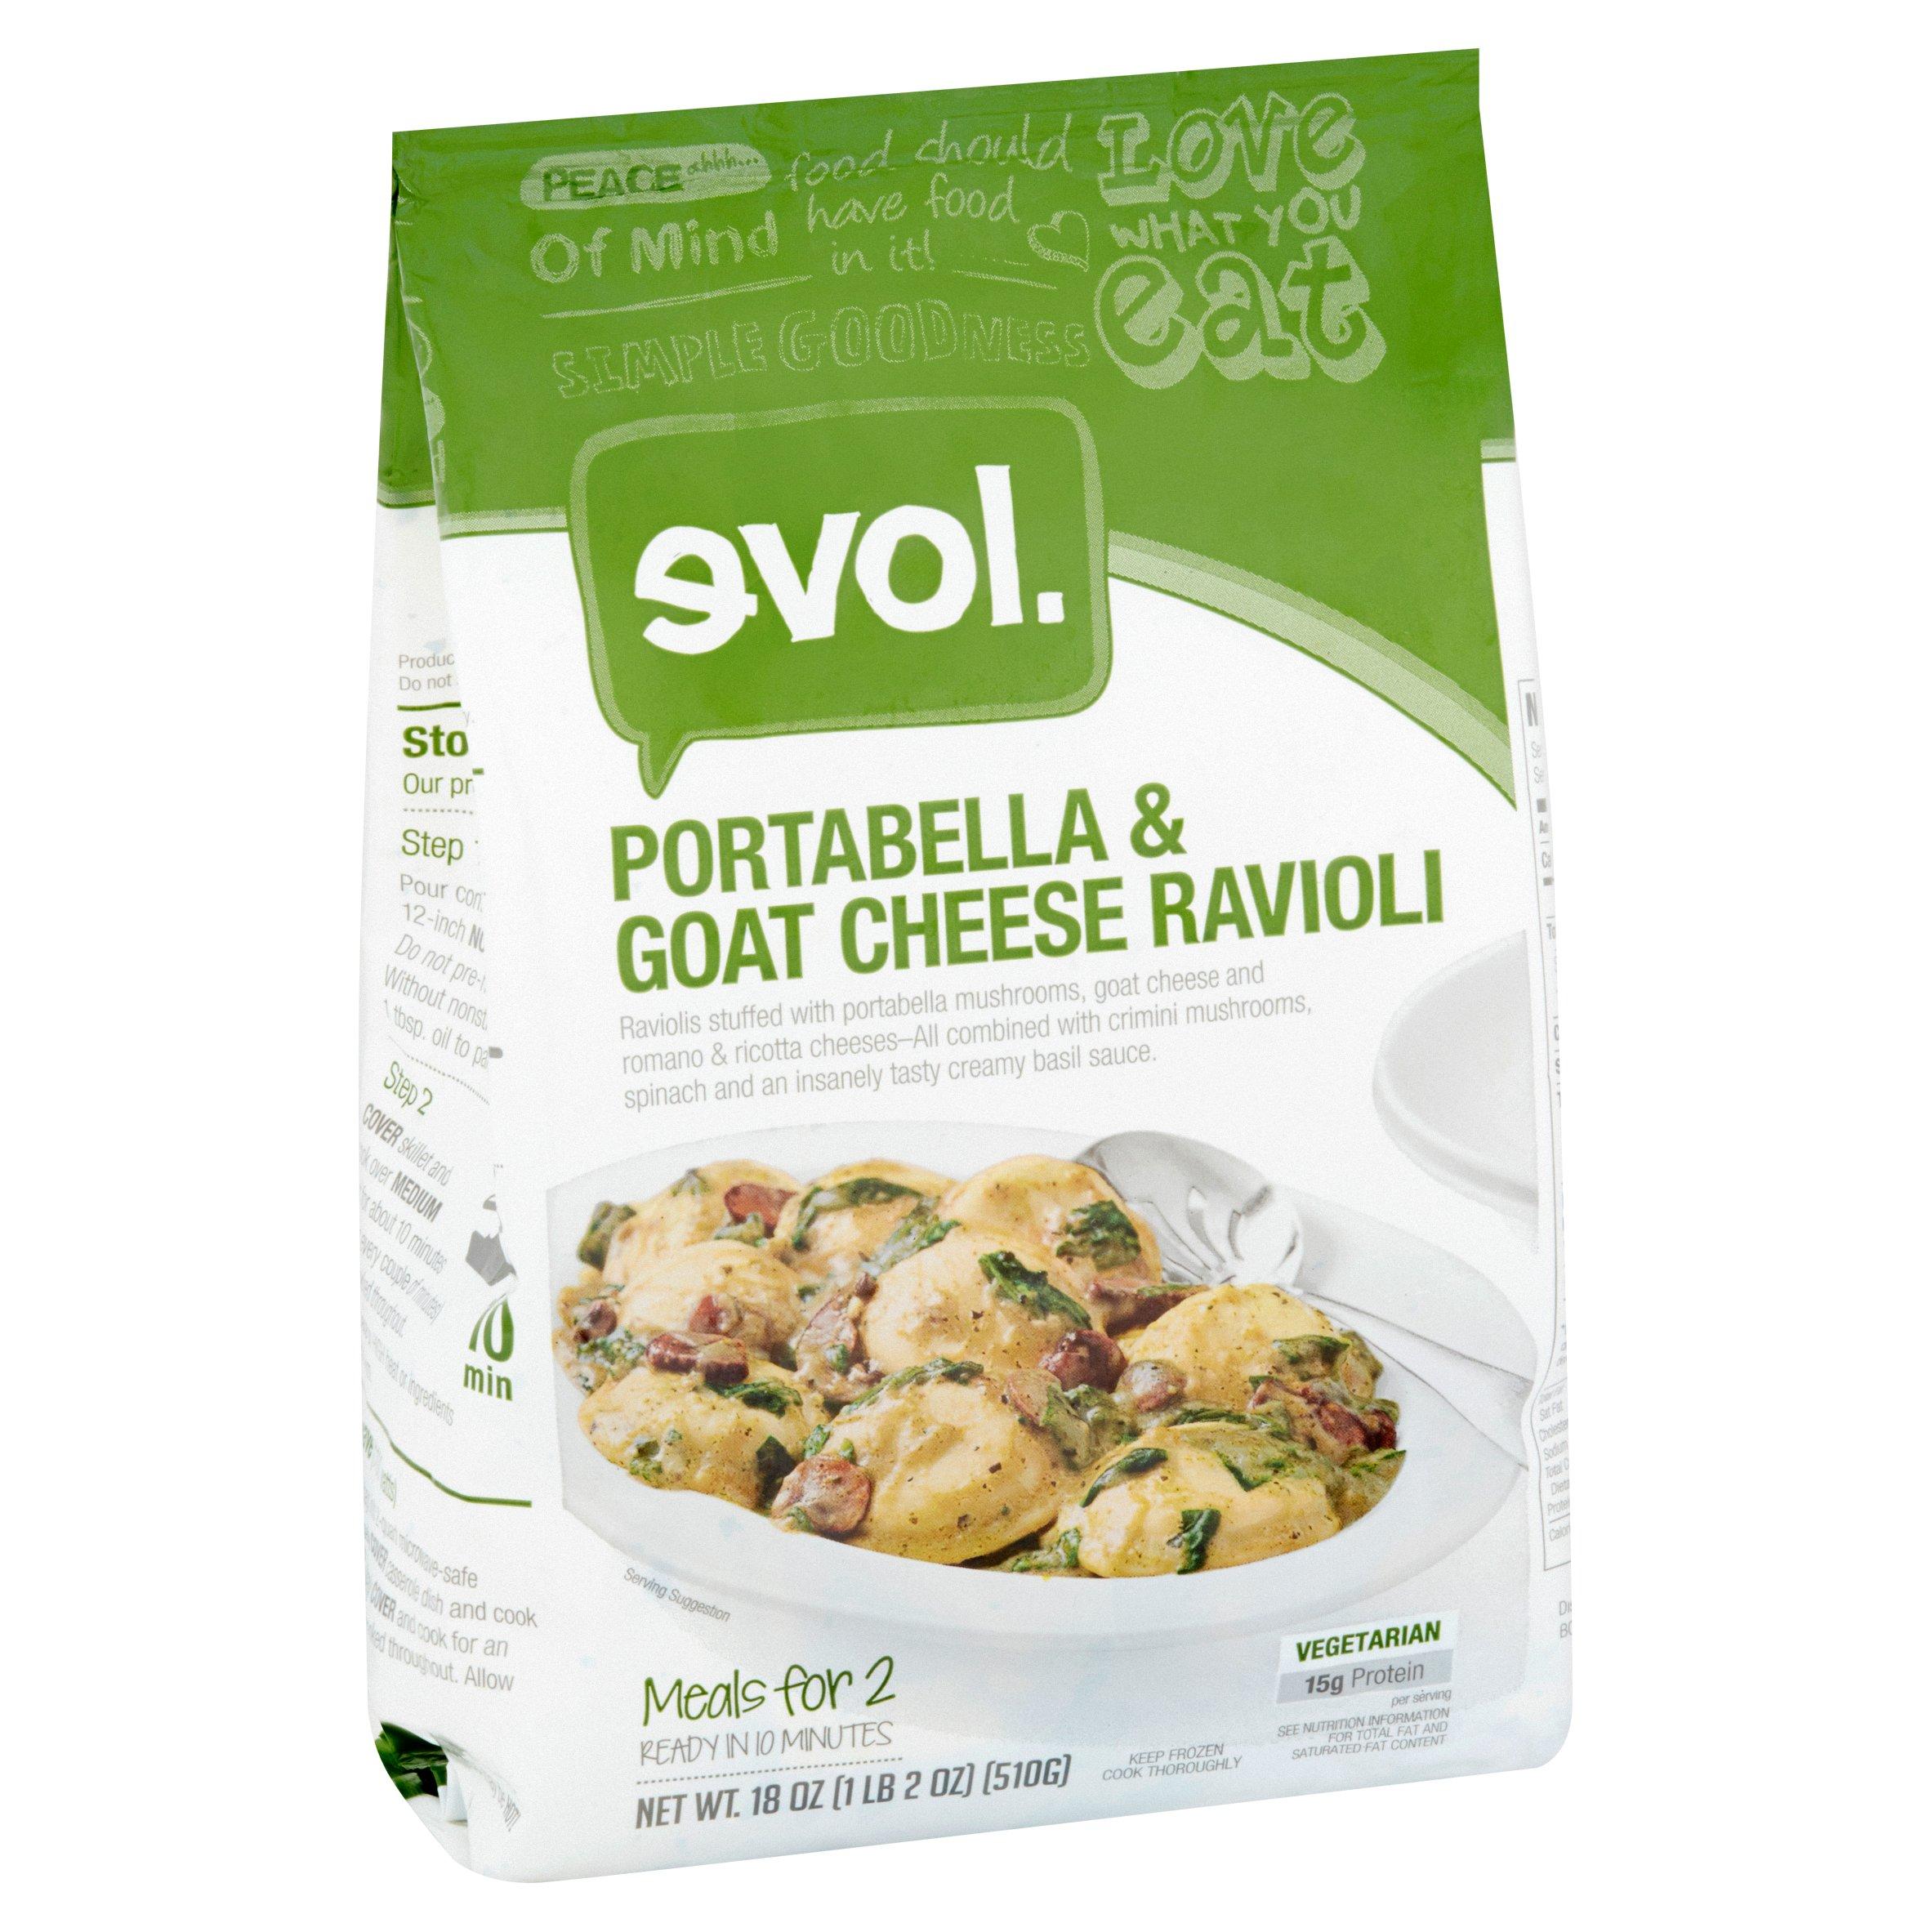 evol. Portabella & Goat Cheese Ravioli, 18 oz - Walmart.com